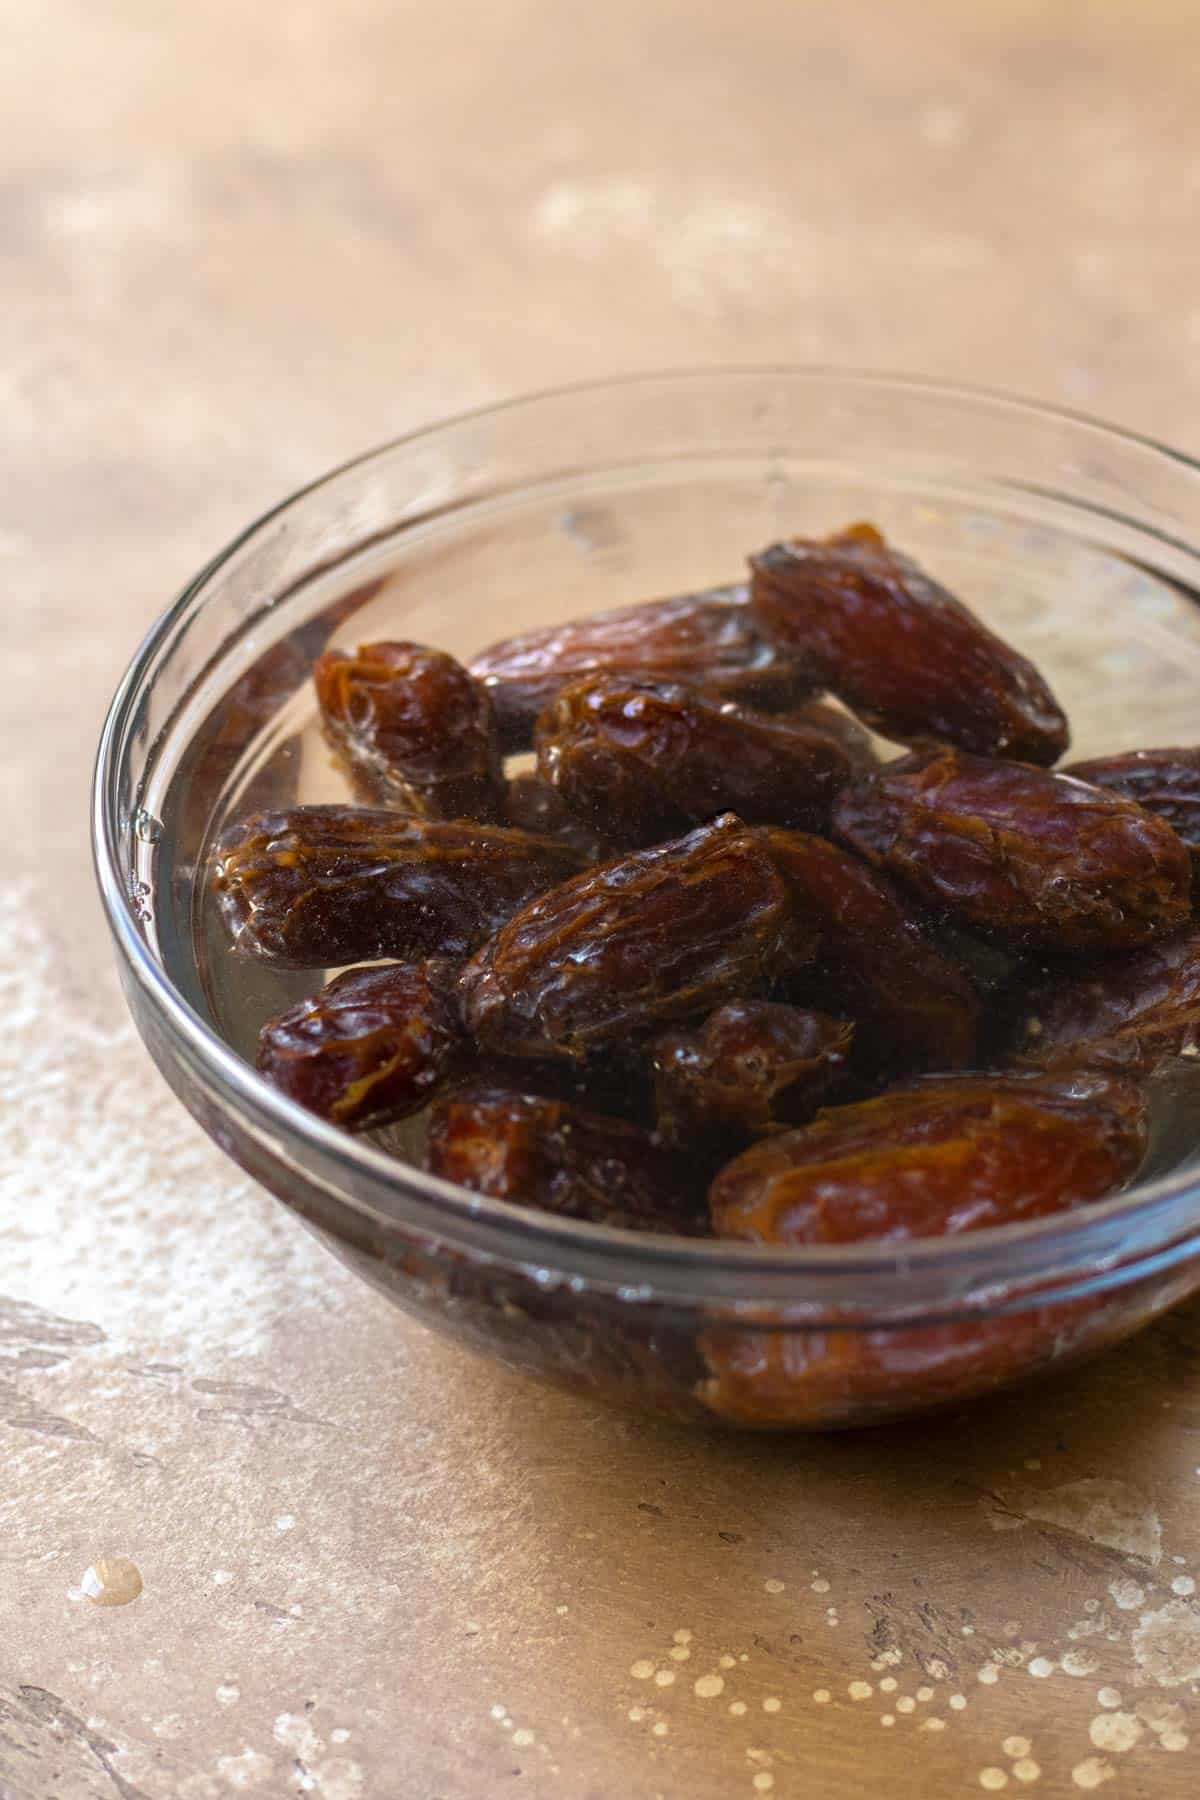 Medjool dates soaking in hot water in glass bowl.